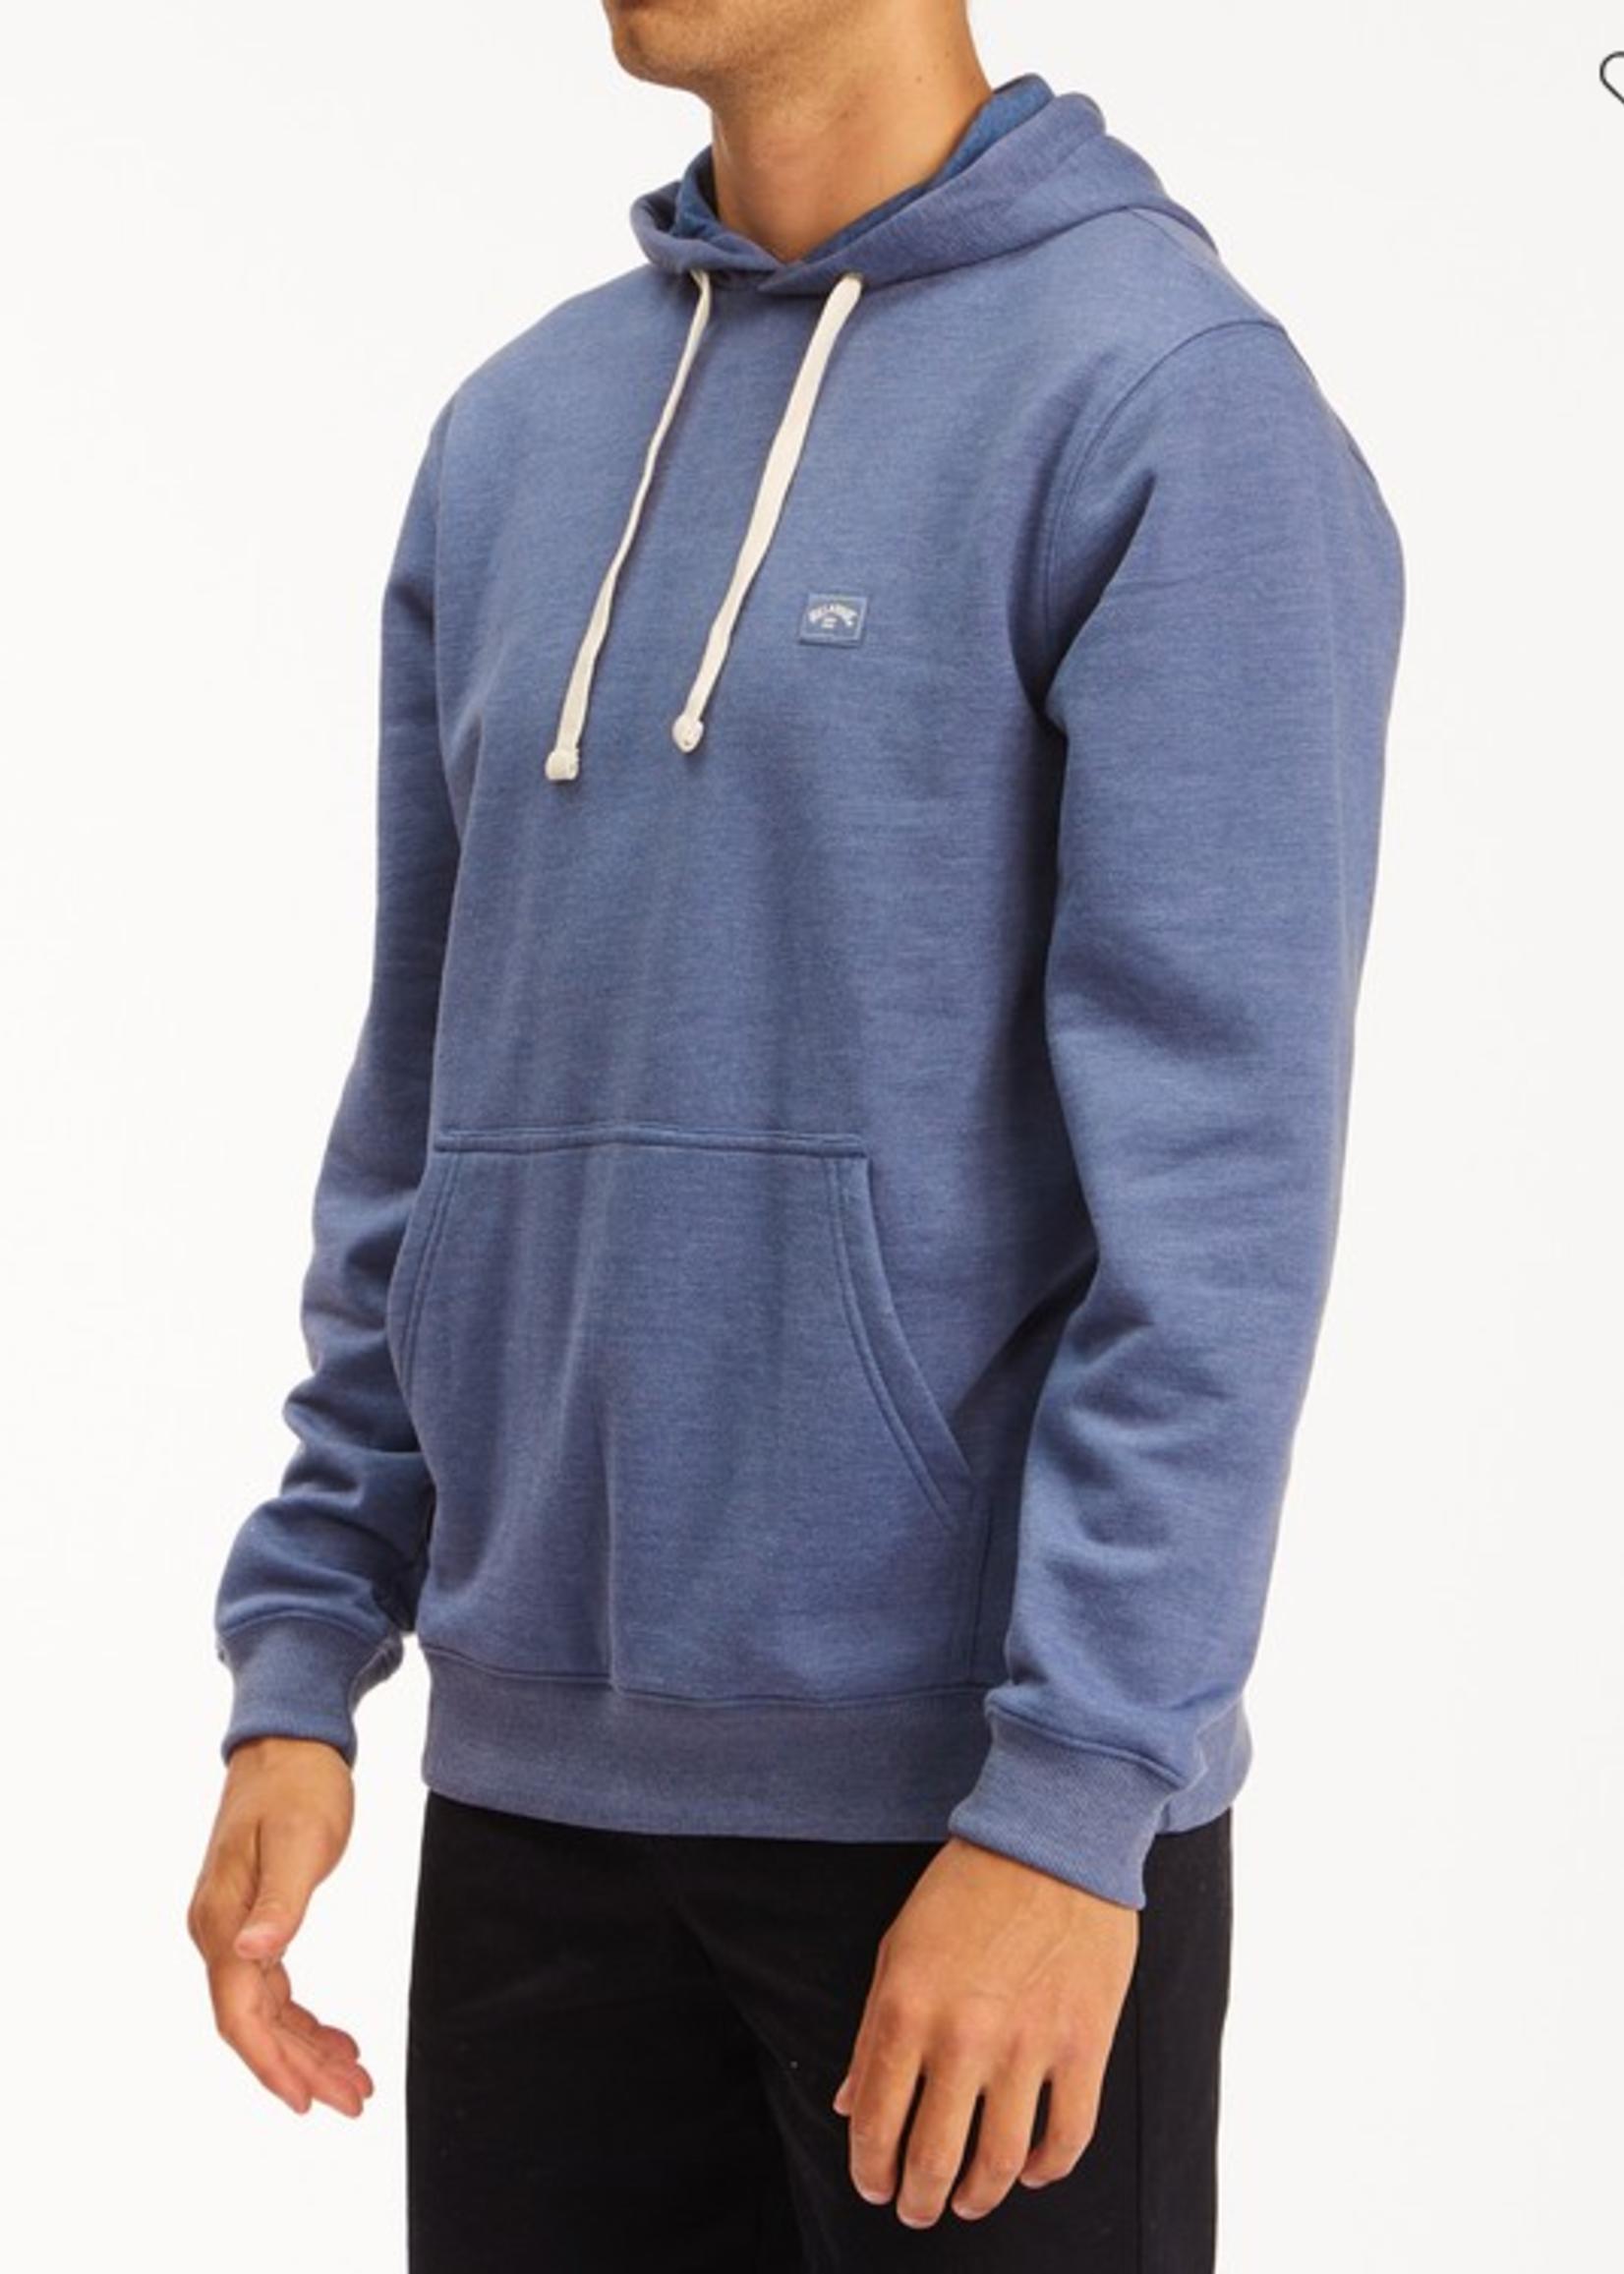 Billabong All Day Pullover - Slate Blue